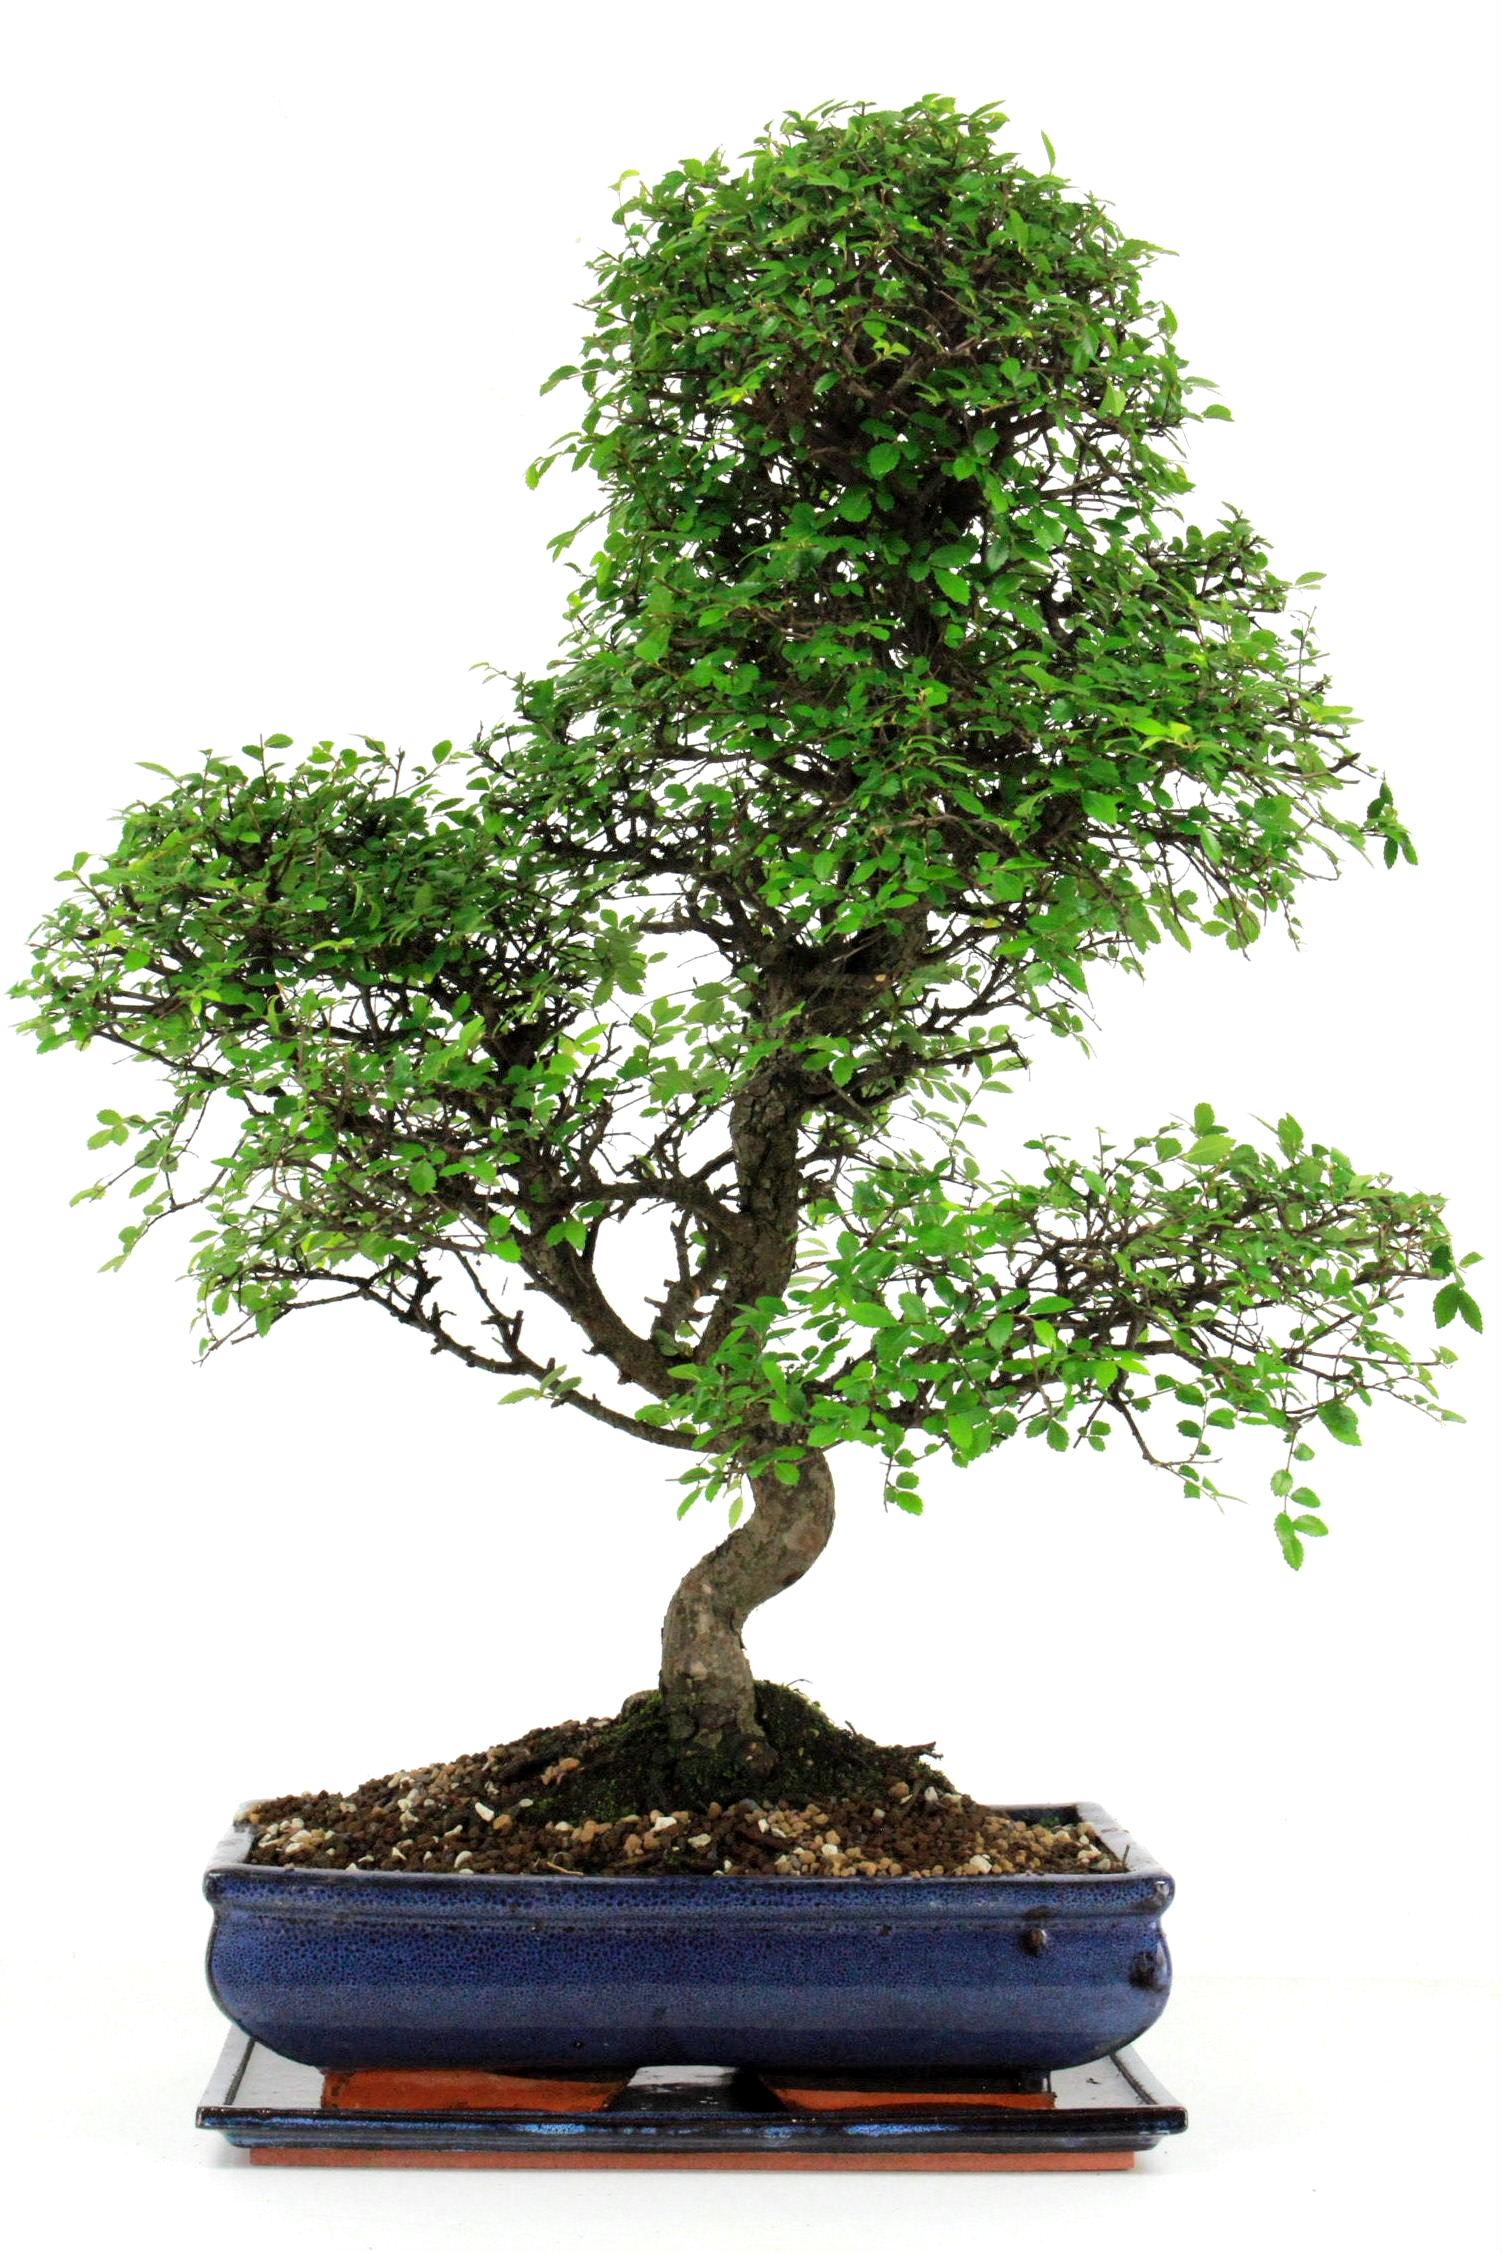 chinesische ulme bonsai 75 cm 342 bei oyaki bonsai kaufen. Black Bedroom Furniture Sets. Home Design Ideas